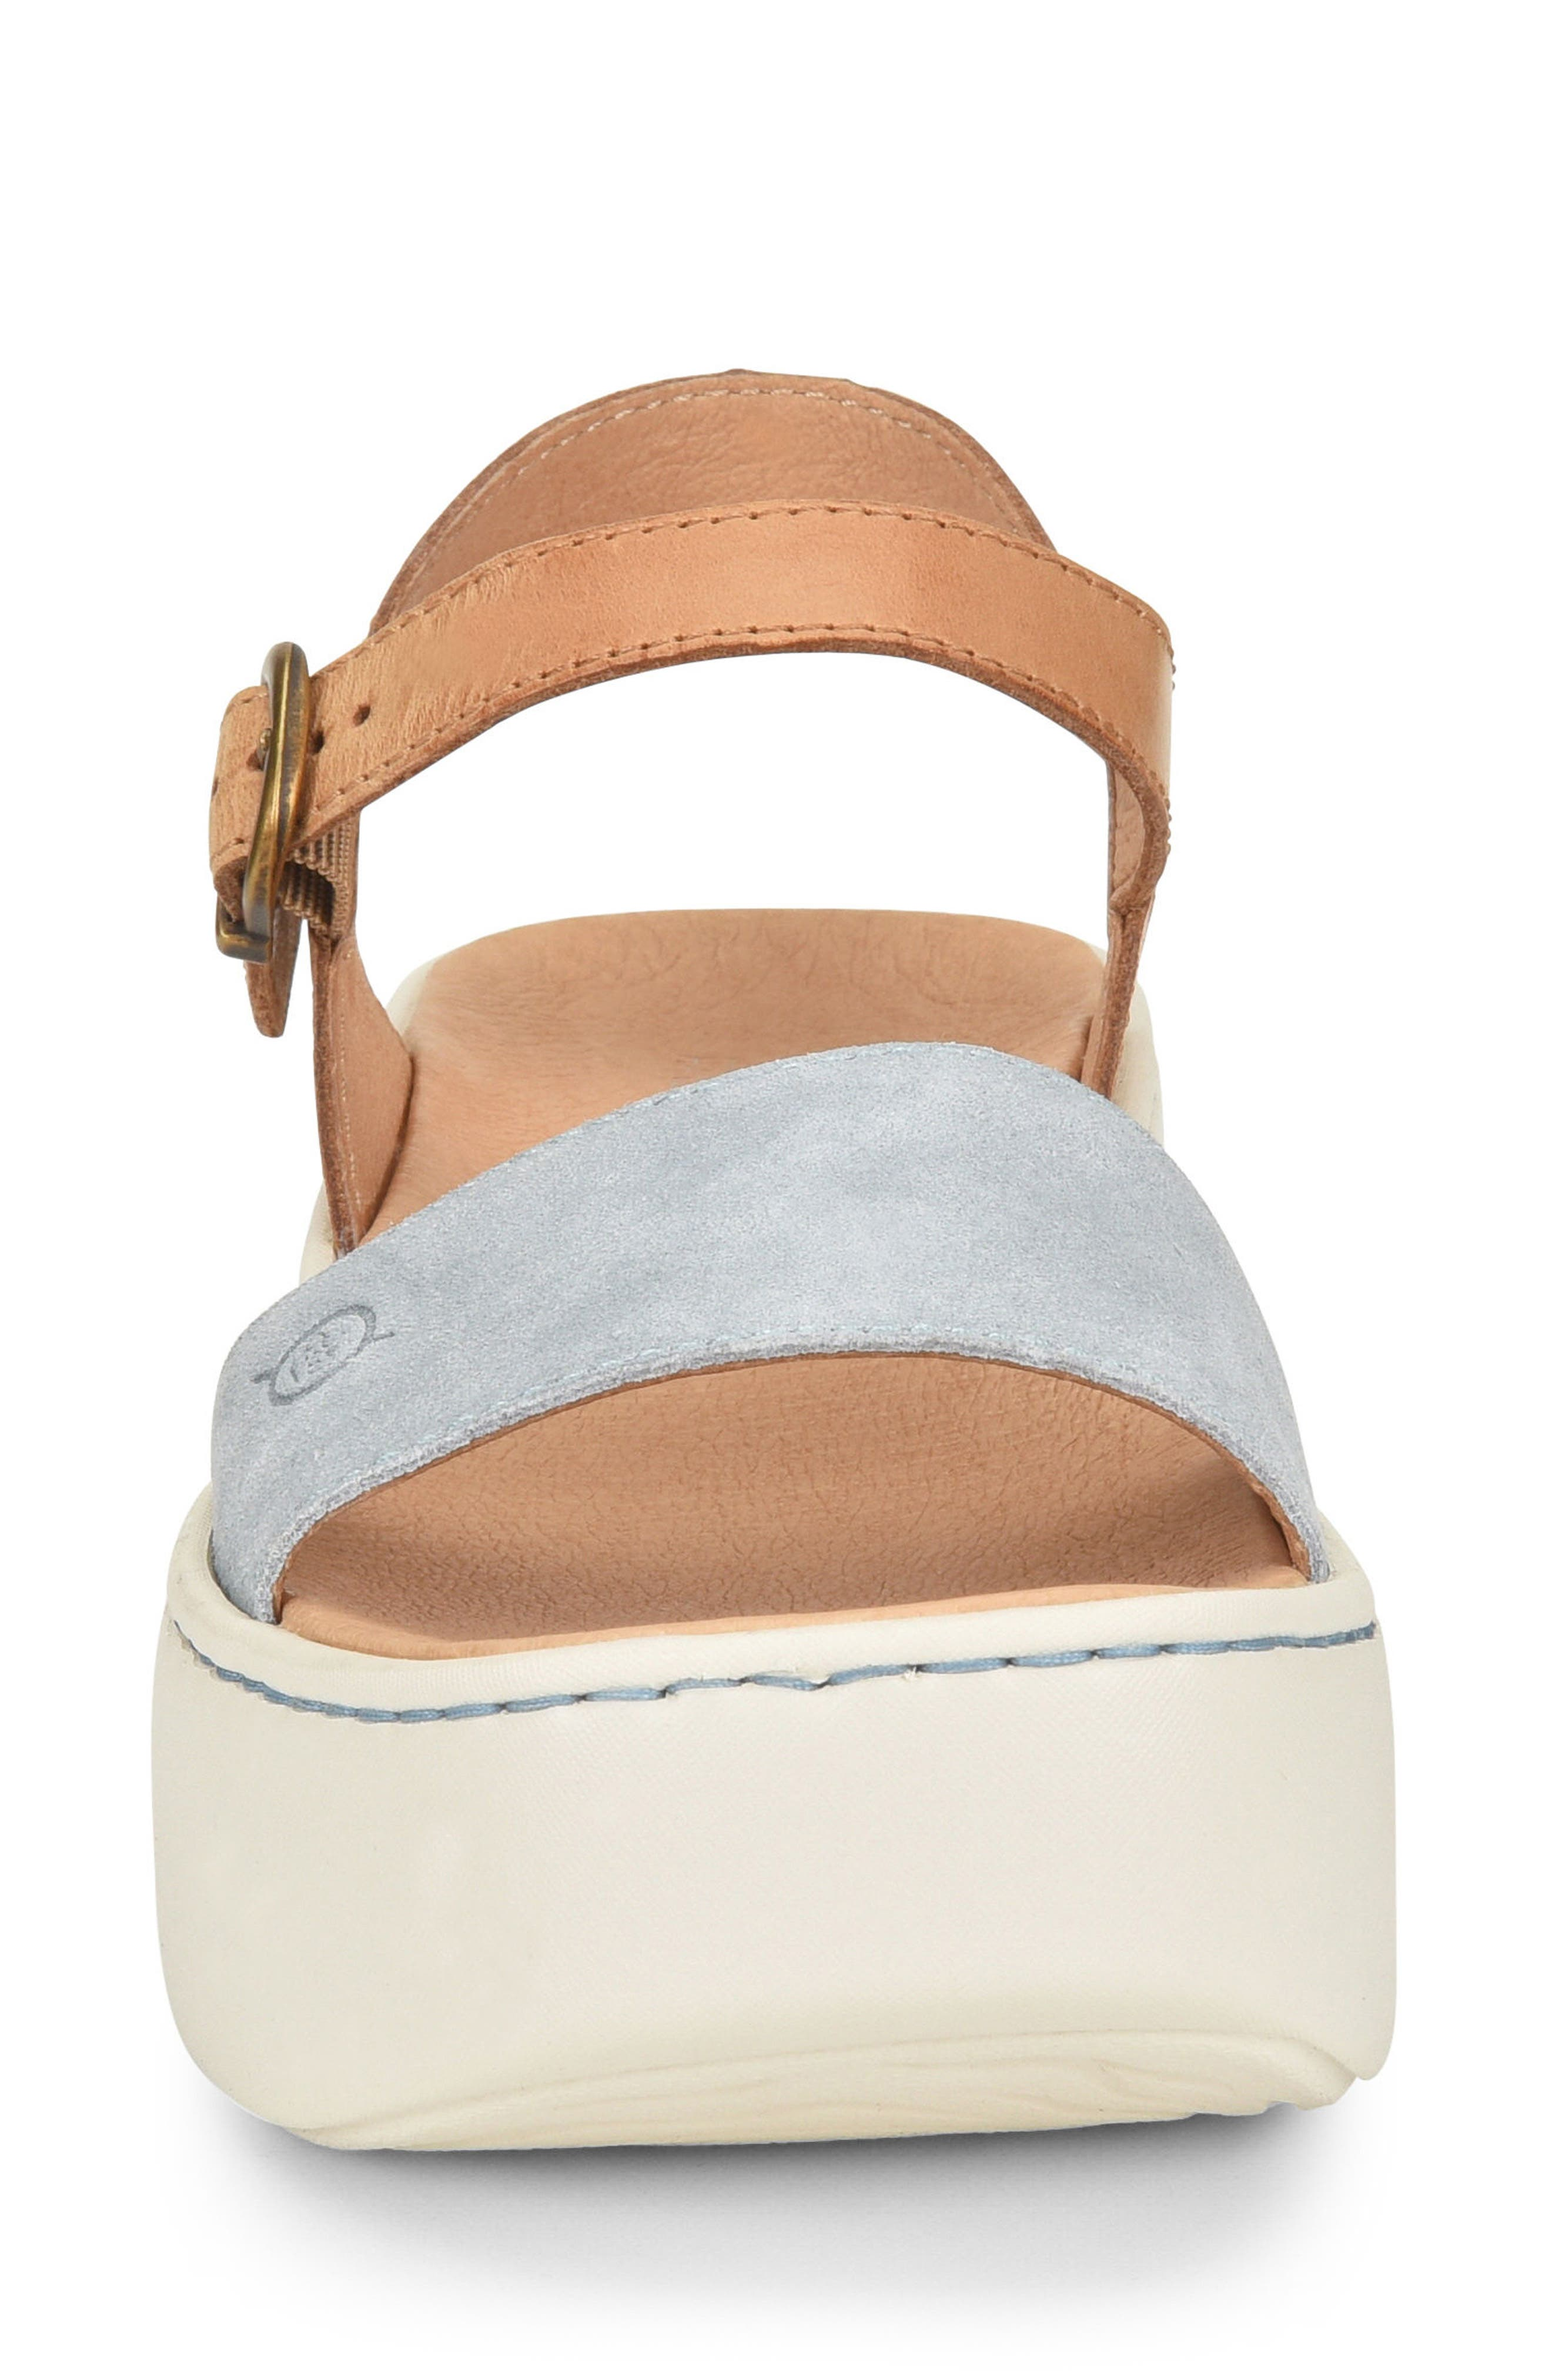 Breaker Platform Sandal,                             Alternate thumbnail 4, color,                             Light Blue/ Tan Leather